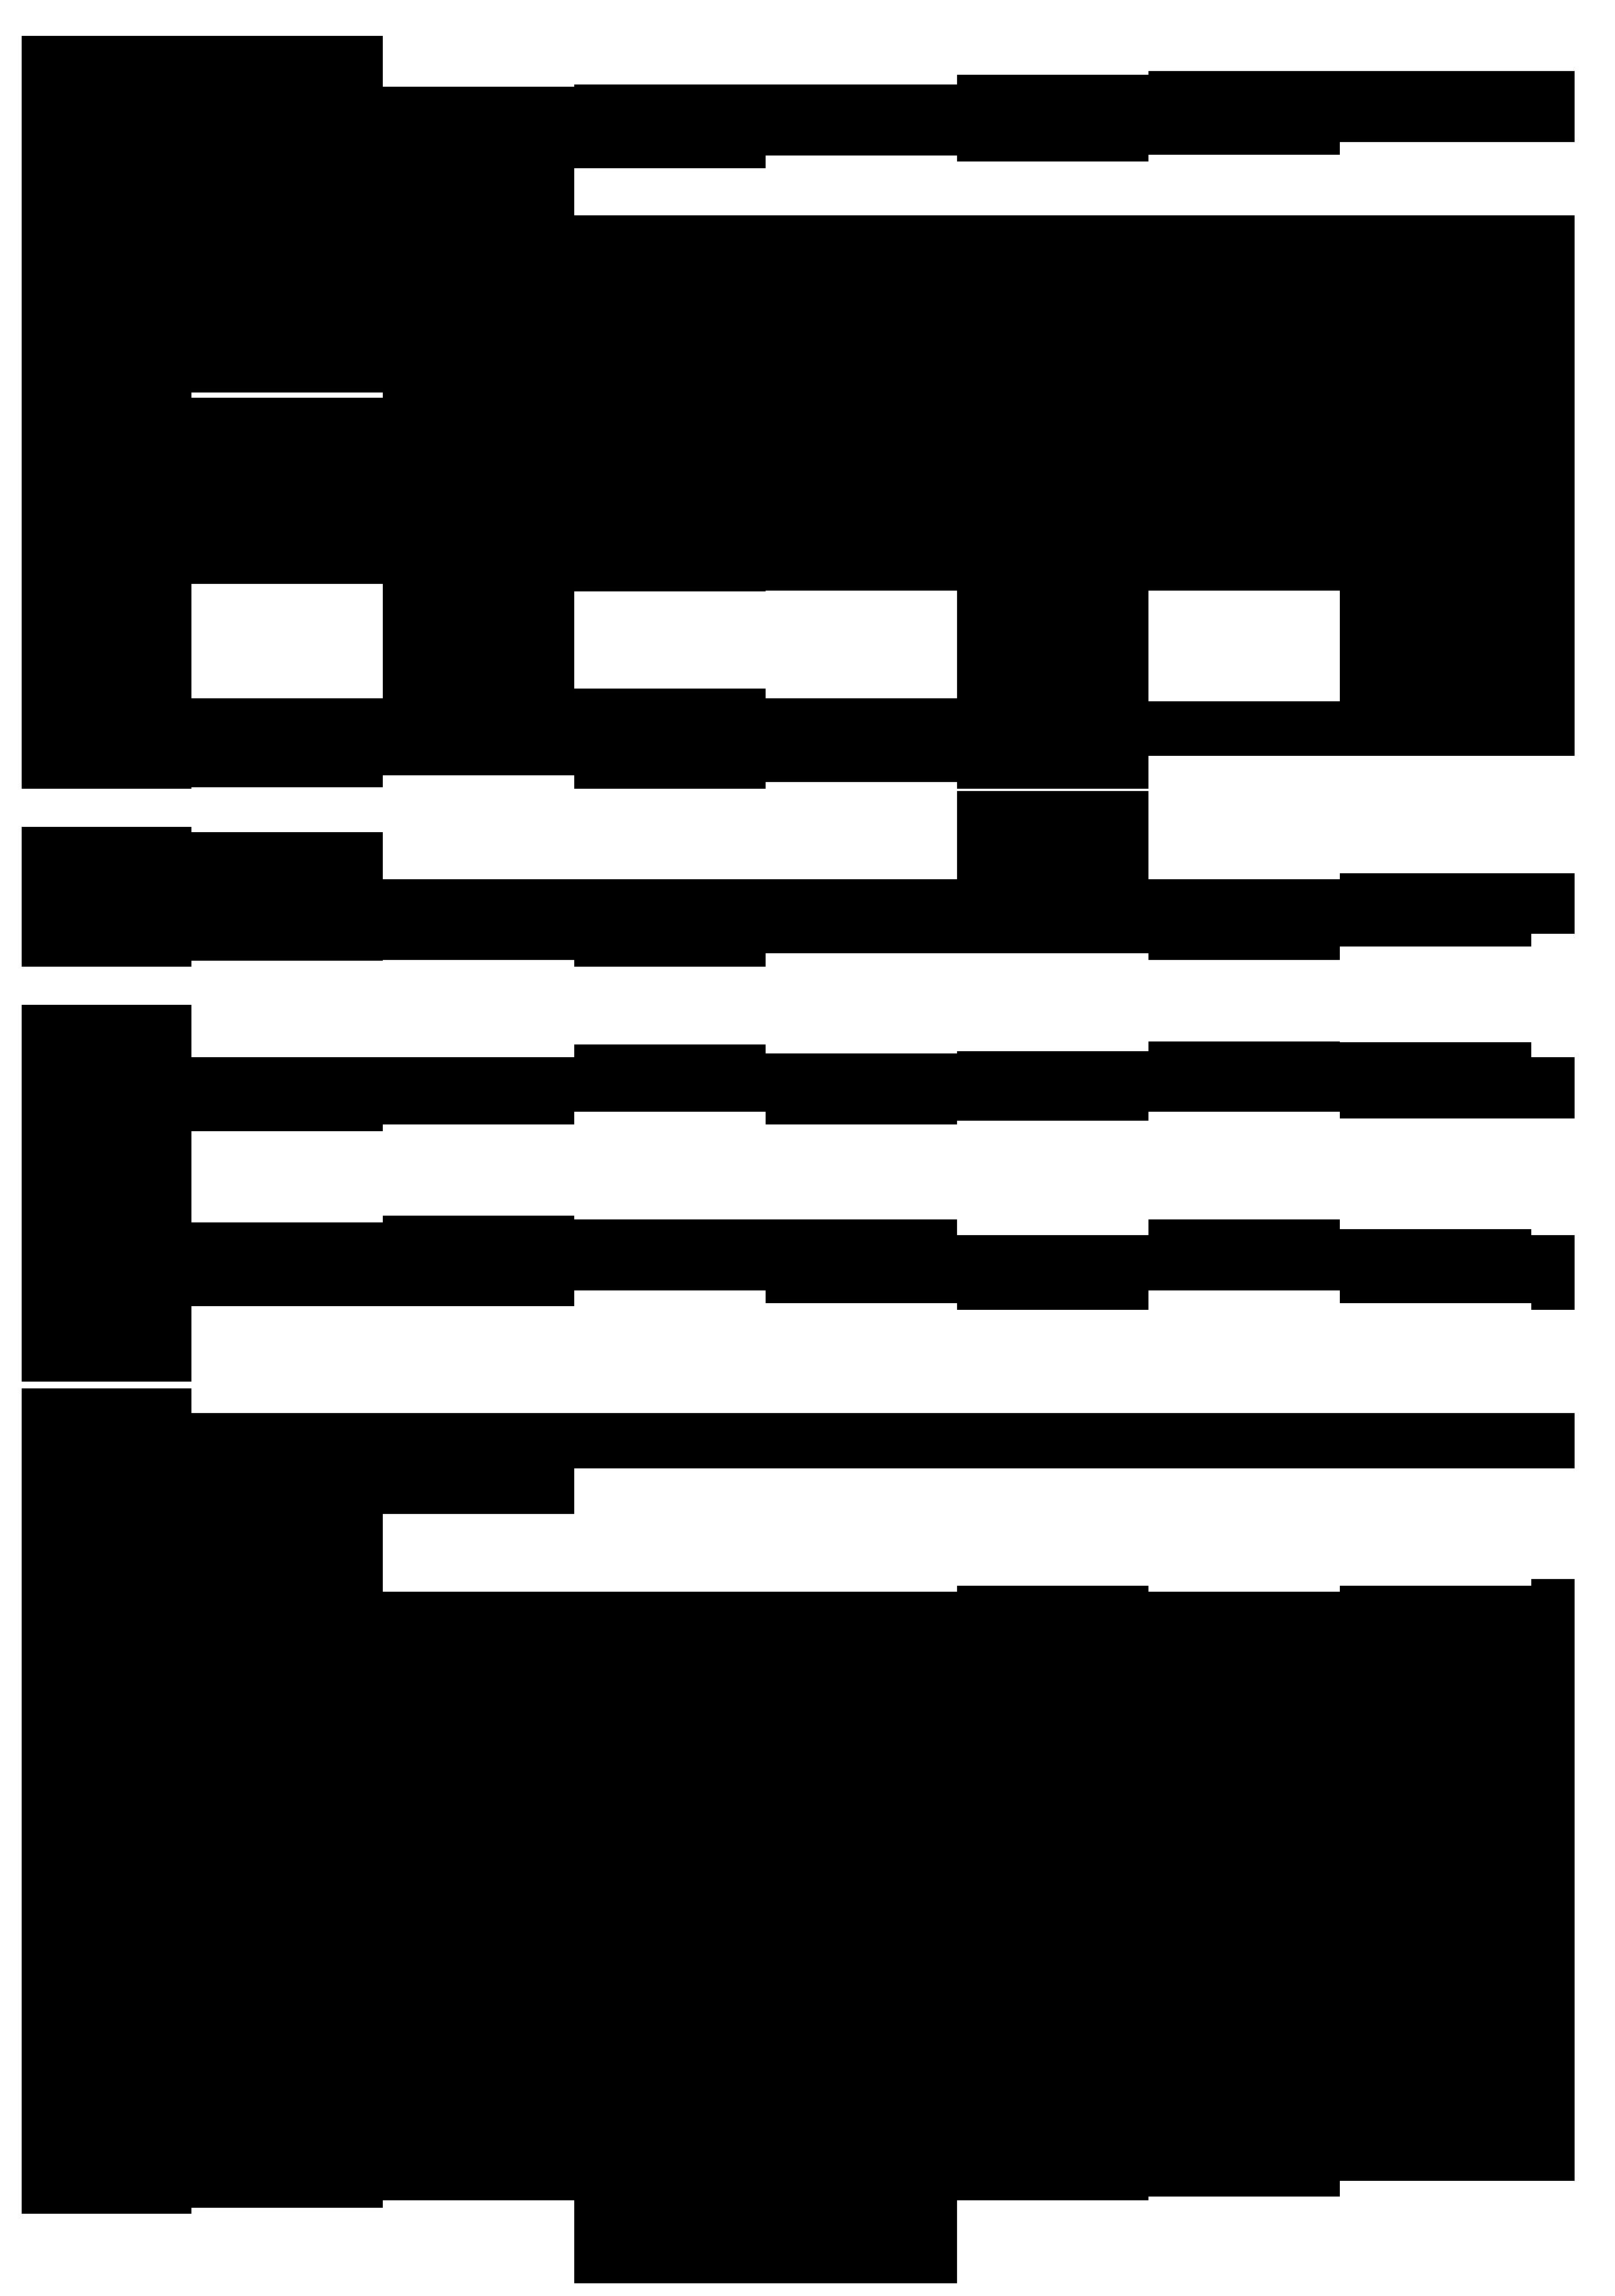 Enkla skalövningar 2 i A-dur